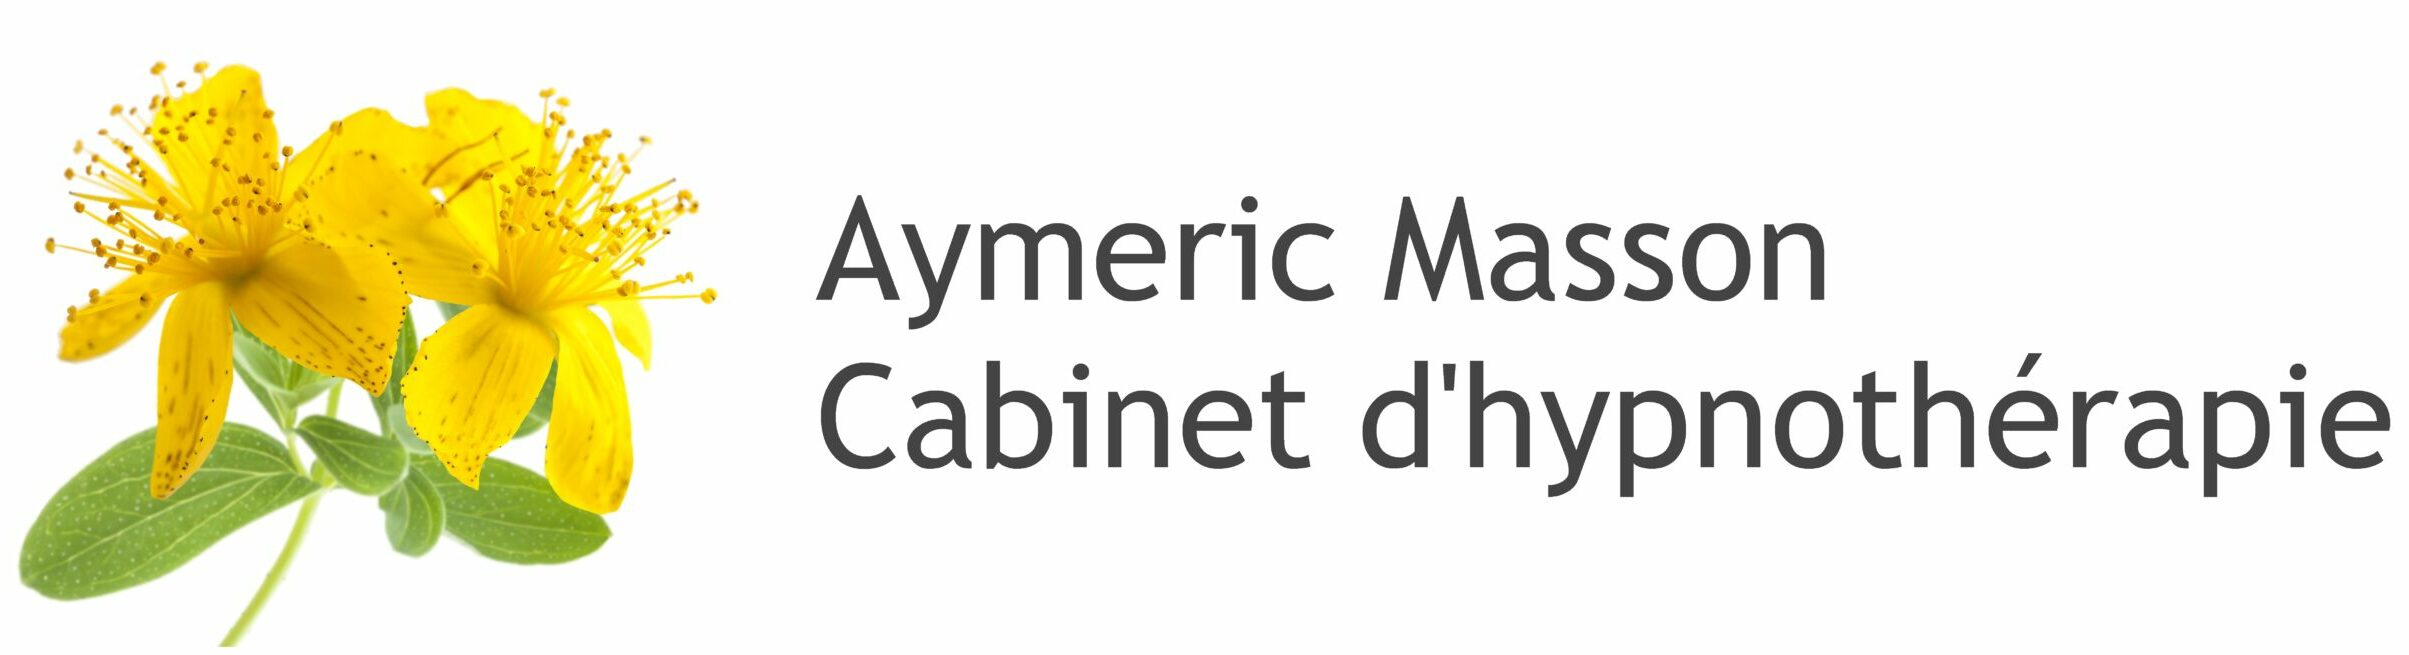 Aymeric Masson – cabinet d'hypnothérapie